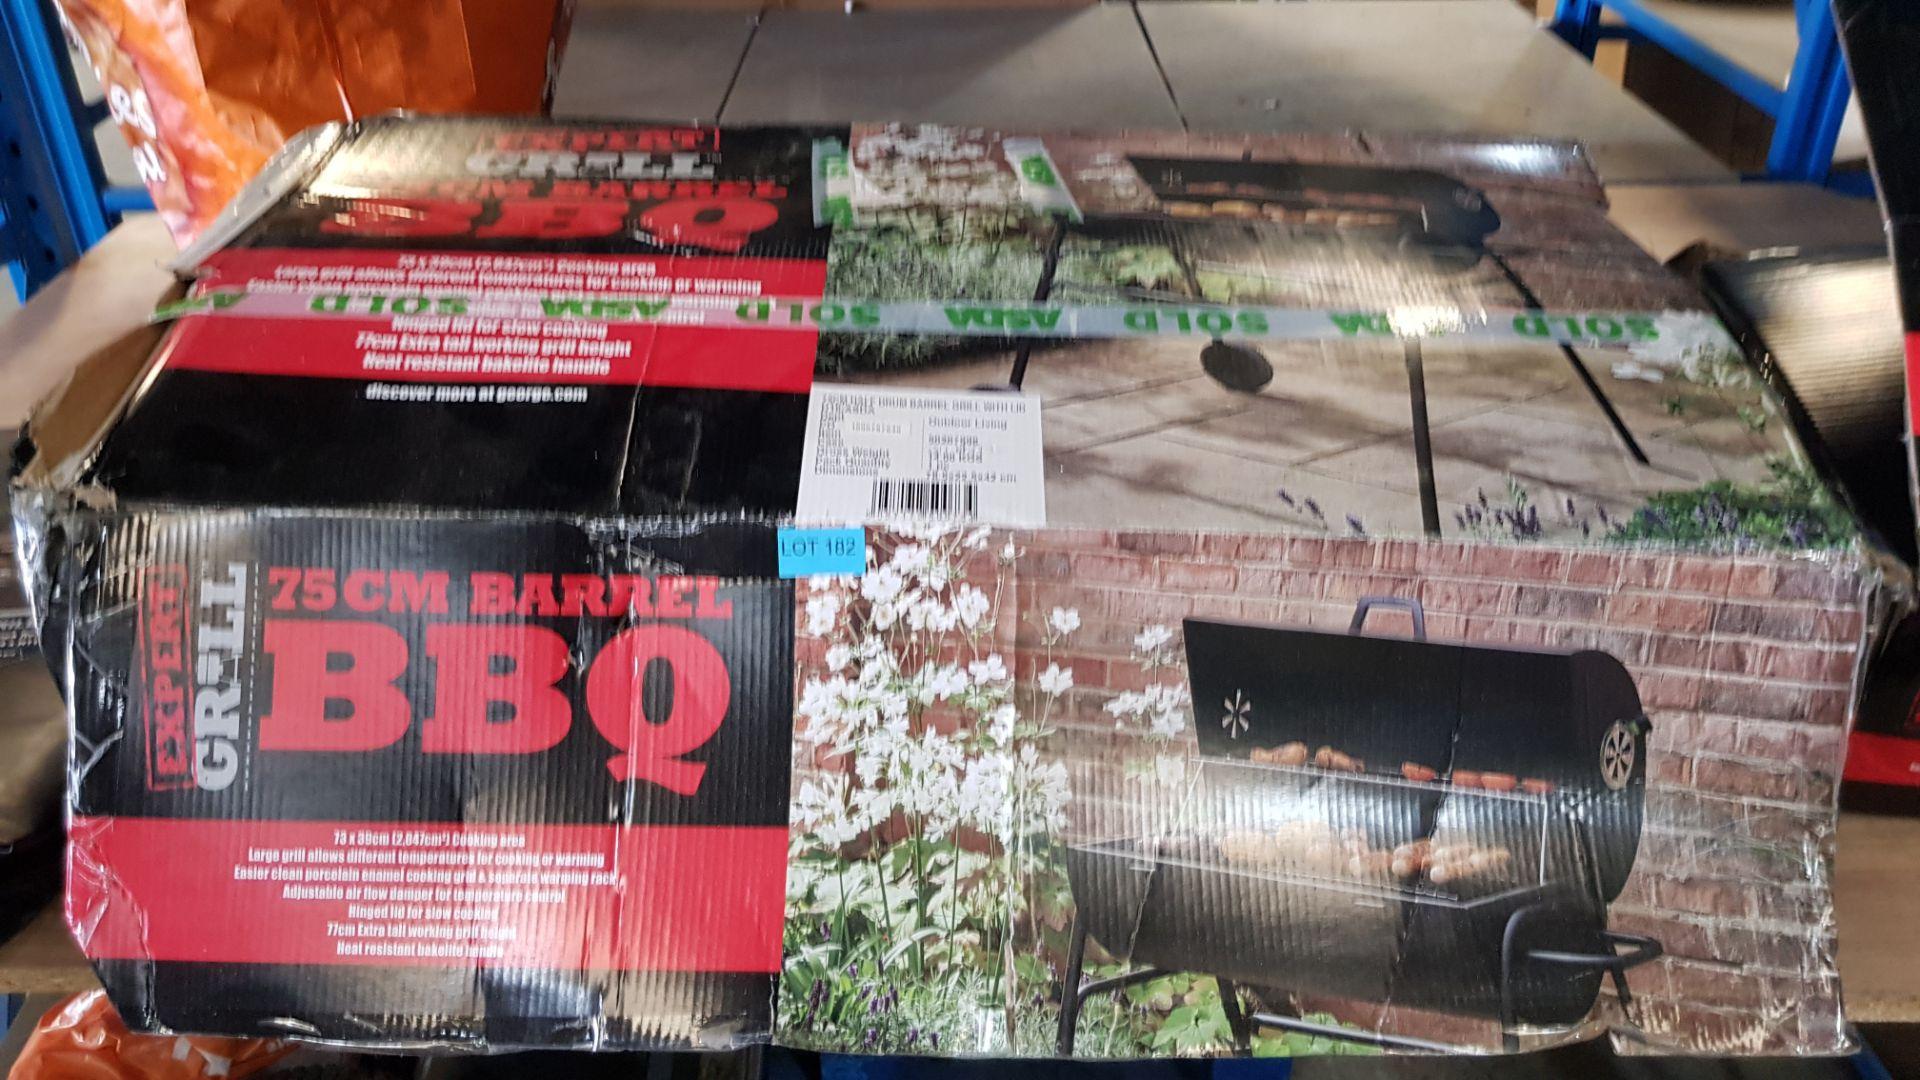 (3H) 4x BBQ Items. 1x Expert Grill The Big Portable Grill. 1x Expert Grill 75cm Barrell BBQ. 1x - Image 6 of 9